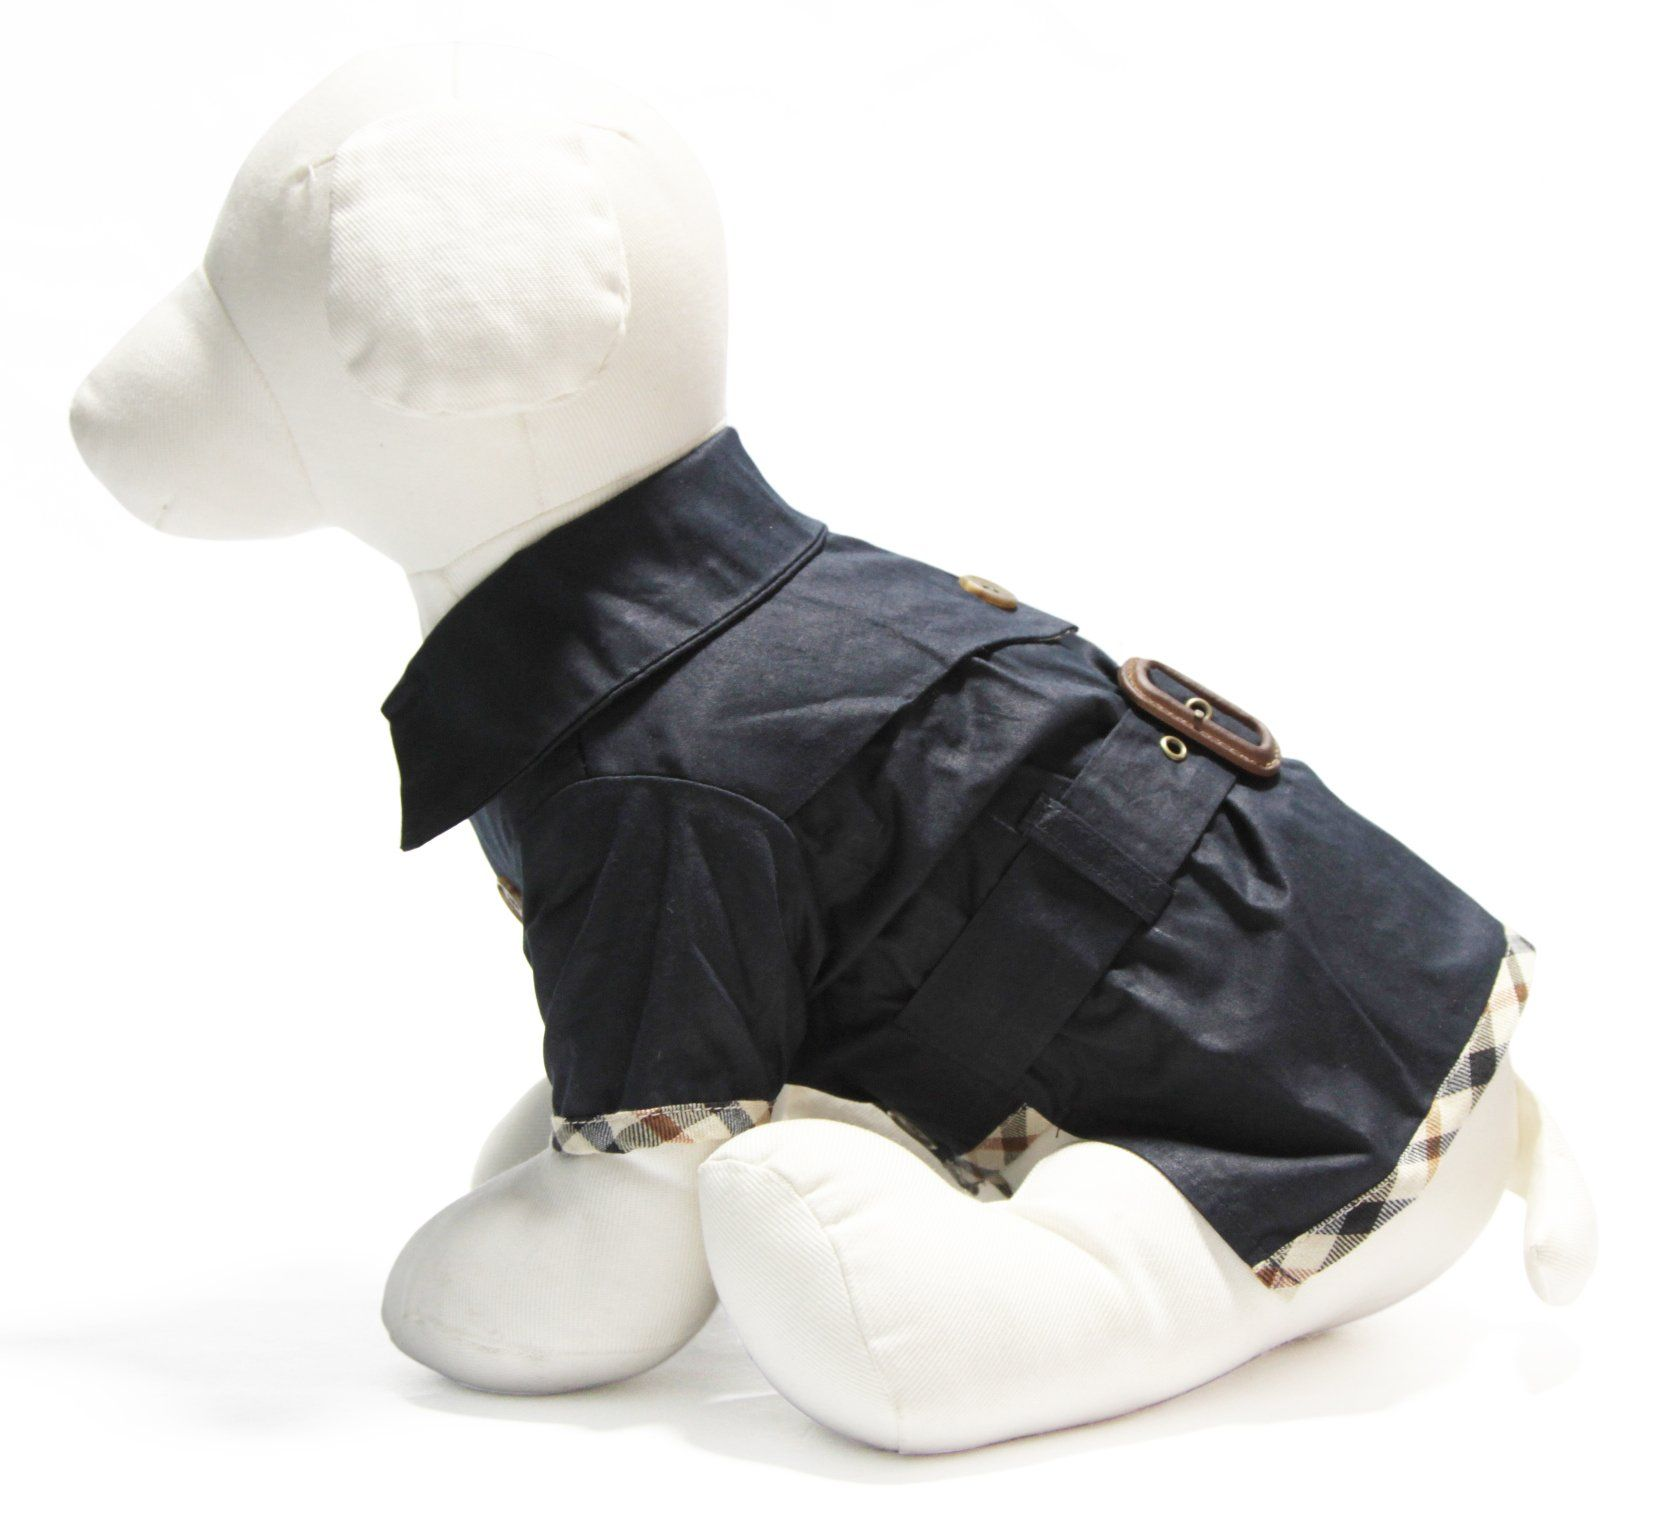 GOOBY Trench Coat für Haustiere Amazon.de Haustier   Haustiere ...